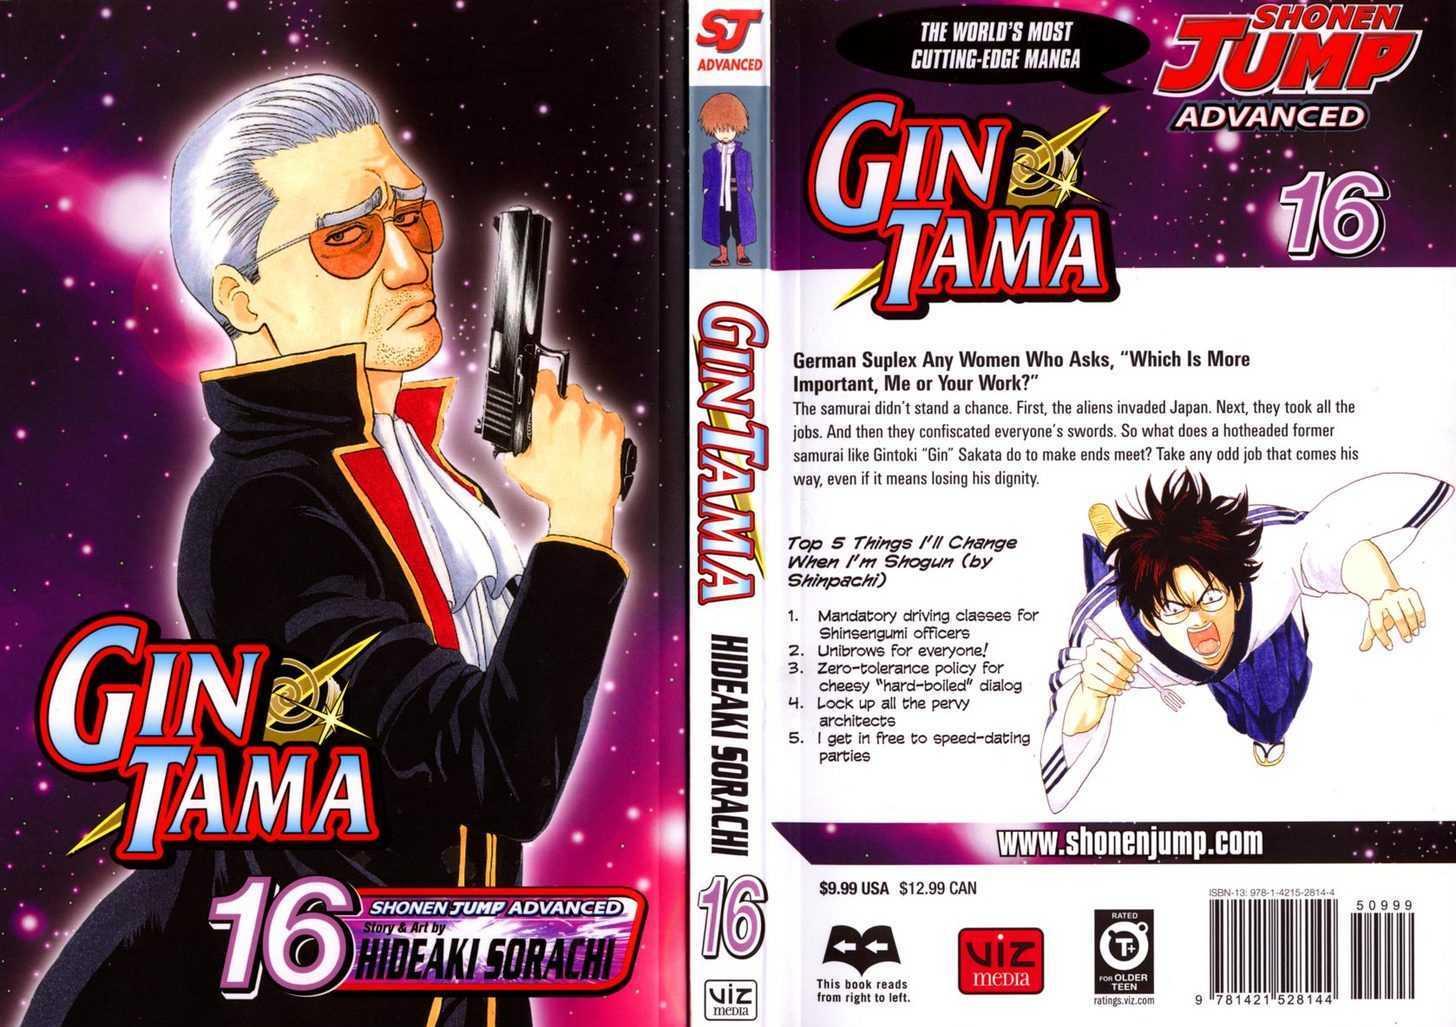 http://im.nineanime.com/comics/pic9/18/210/16603/Gintama1310201.jpg Page 1